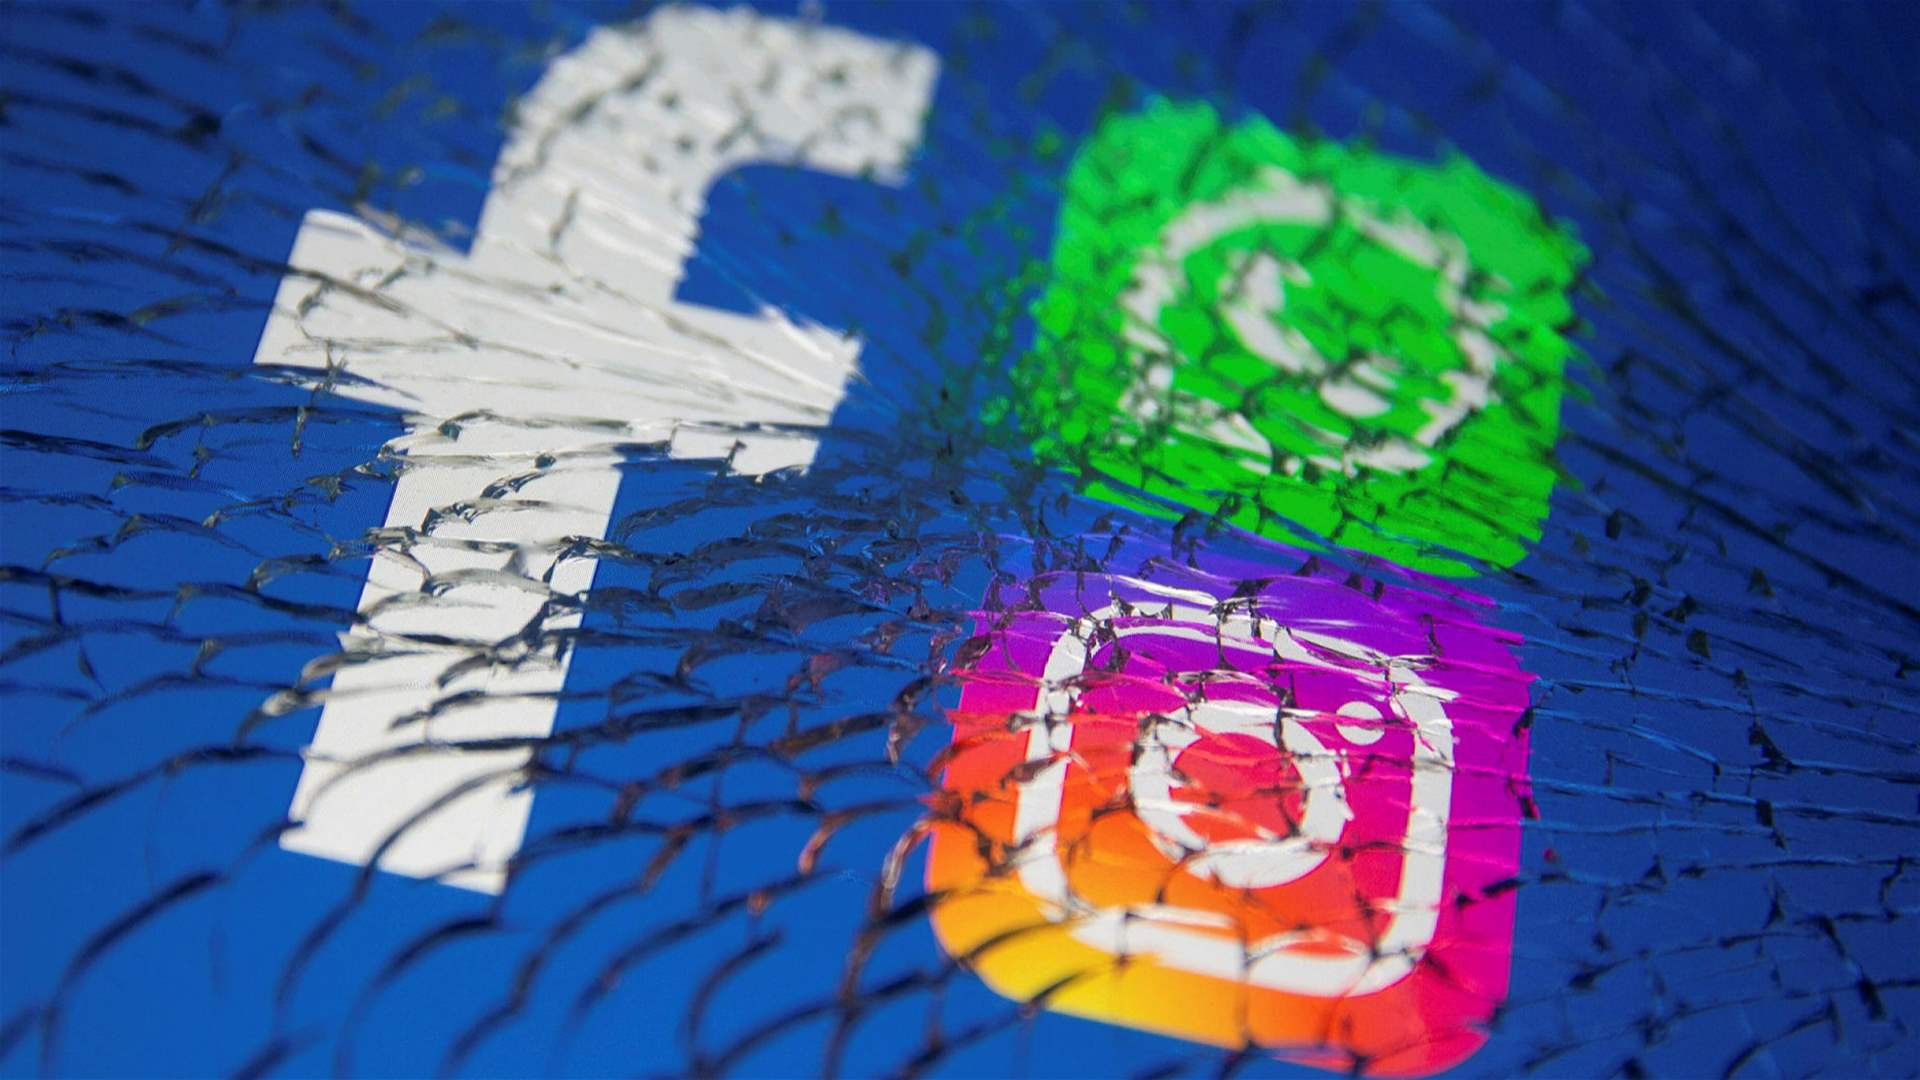 What Happened to Facebook, Instagram, & WhatsApp?